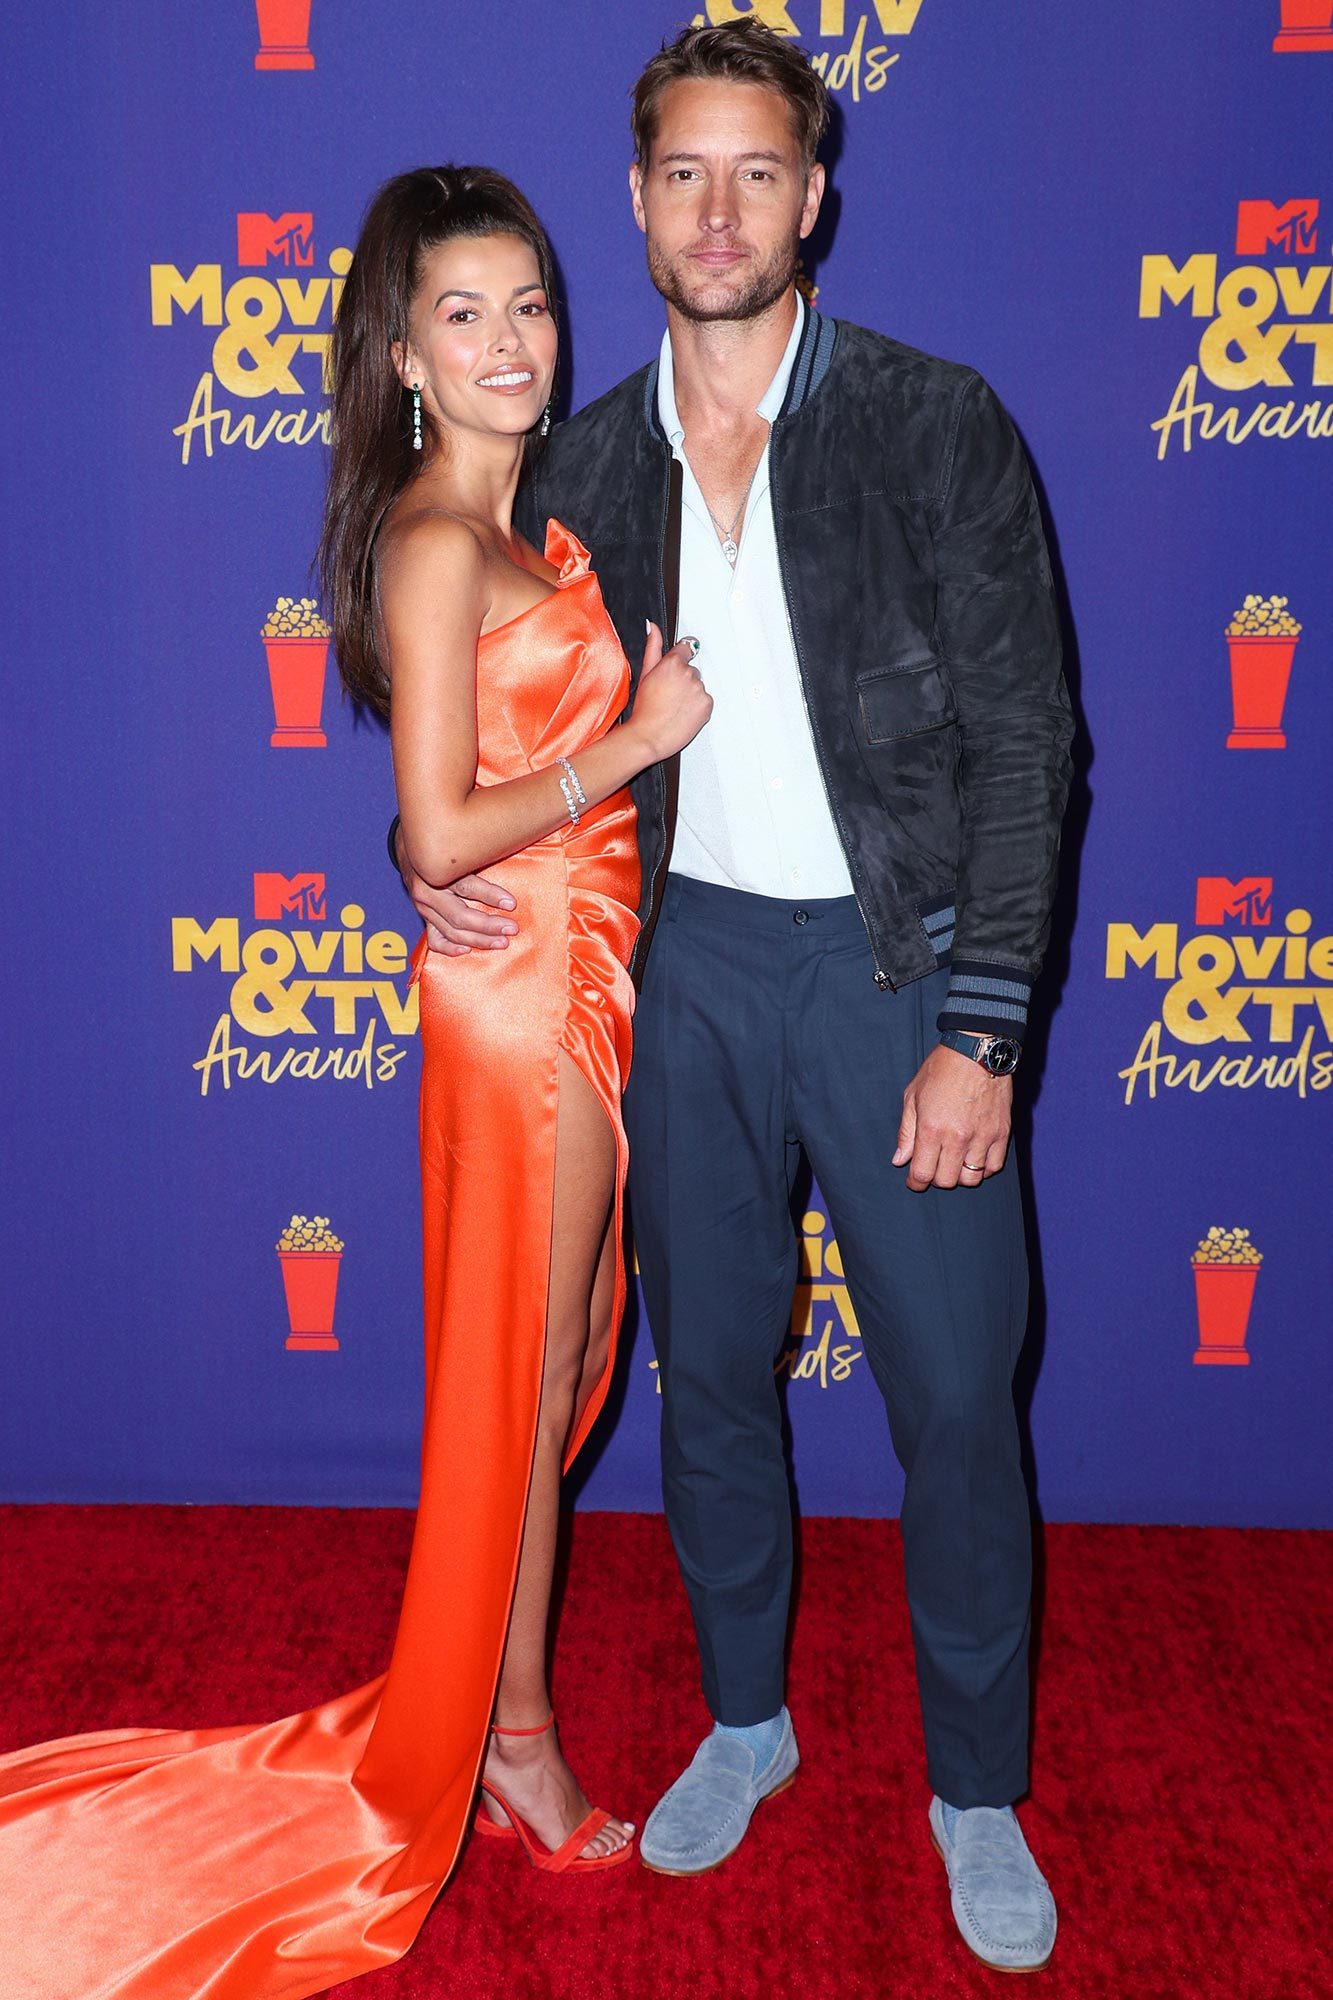 MTV Movie & TV Awards Sofia Pernas and Justin Hartley